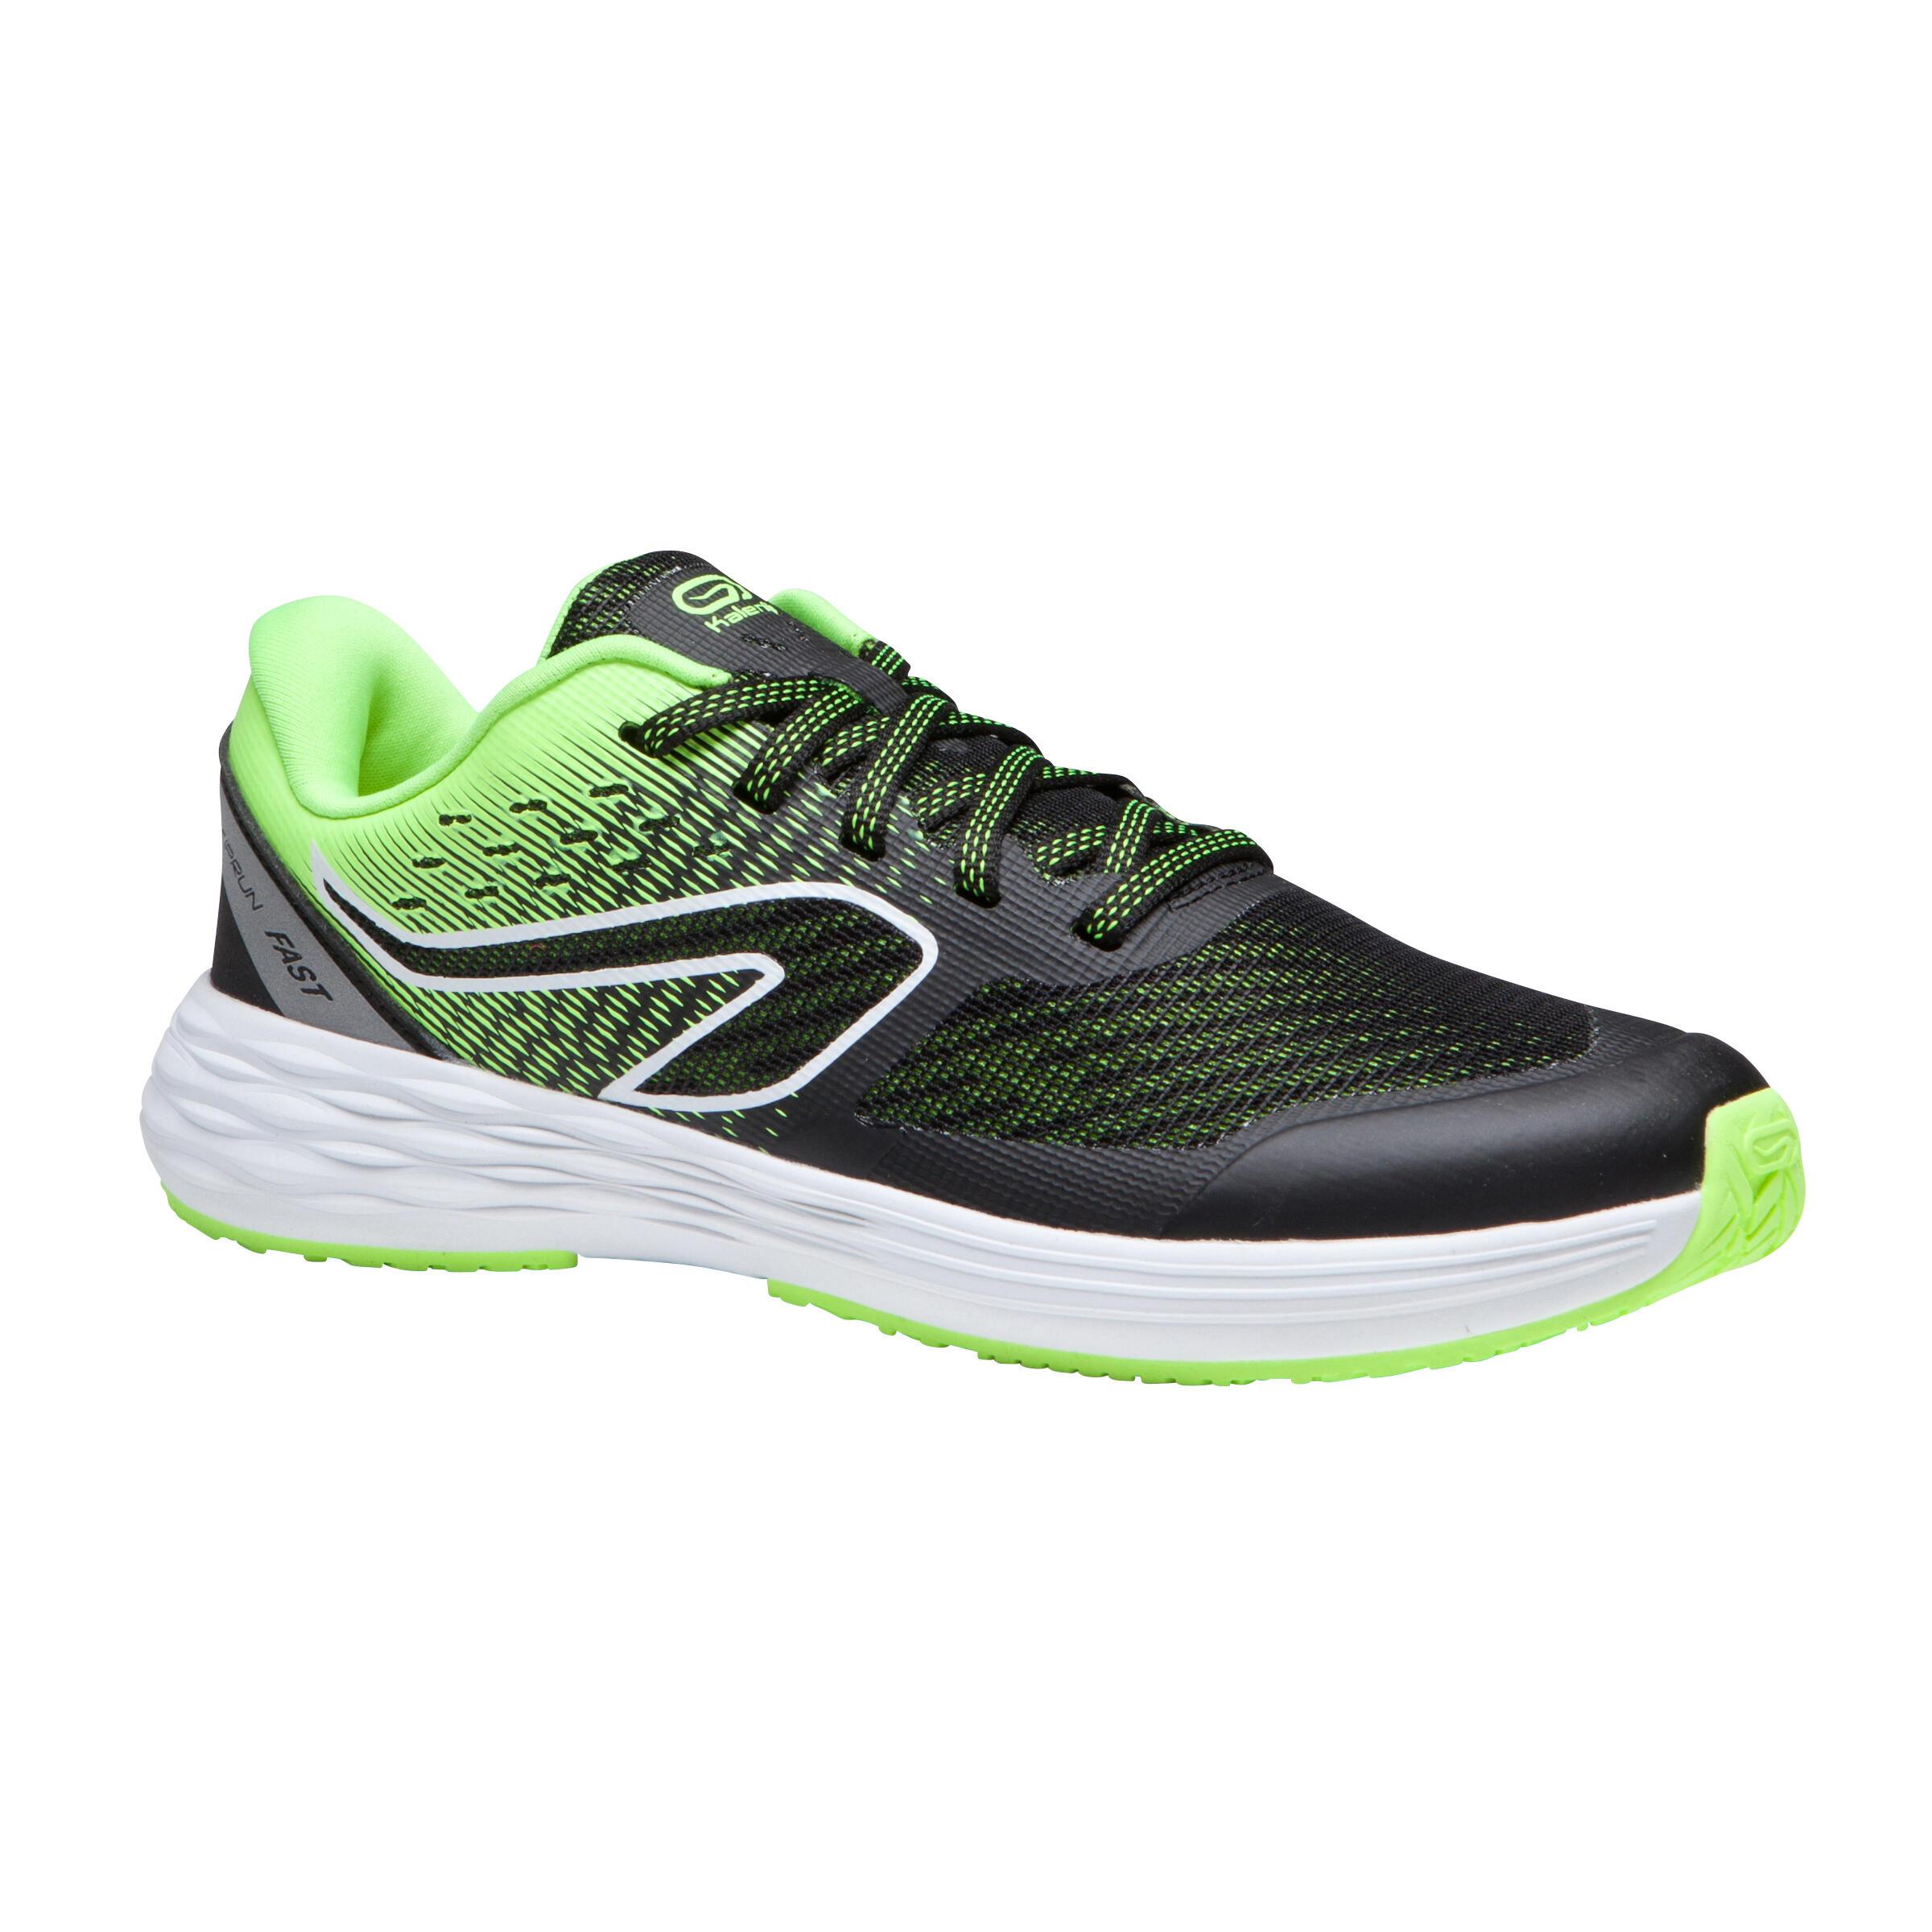 chaussures enfant d' athlétisme AT 500 kiprun fast noires jaunes - Kalenji